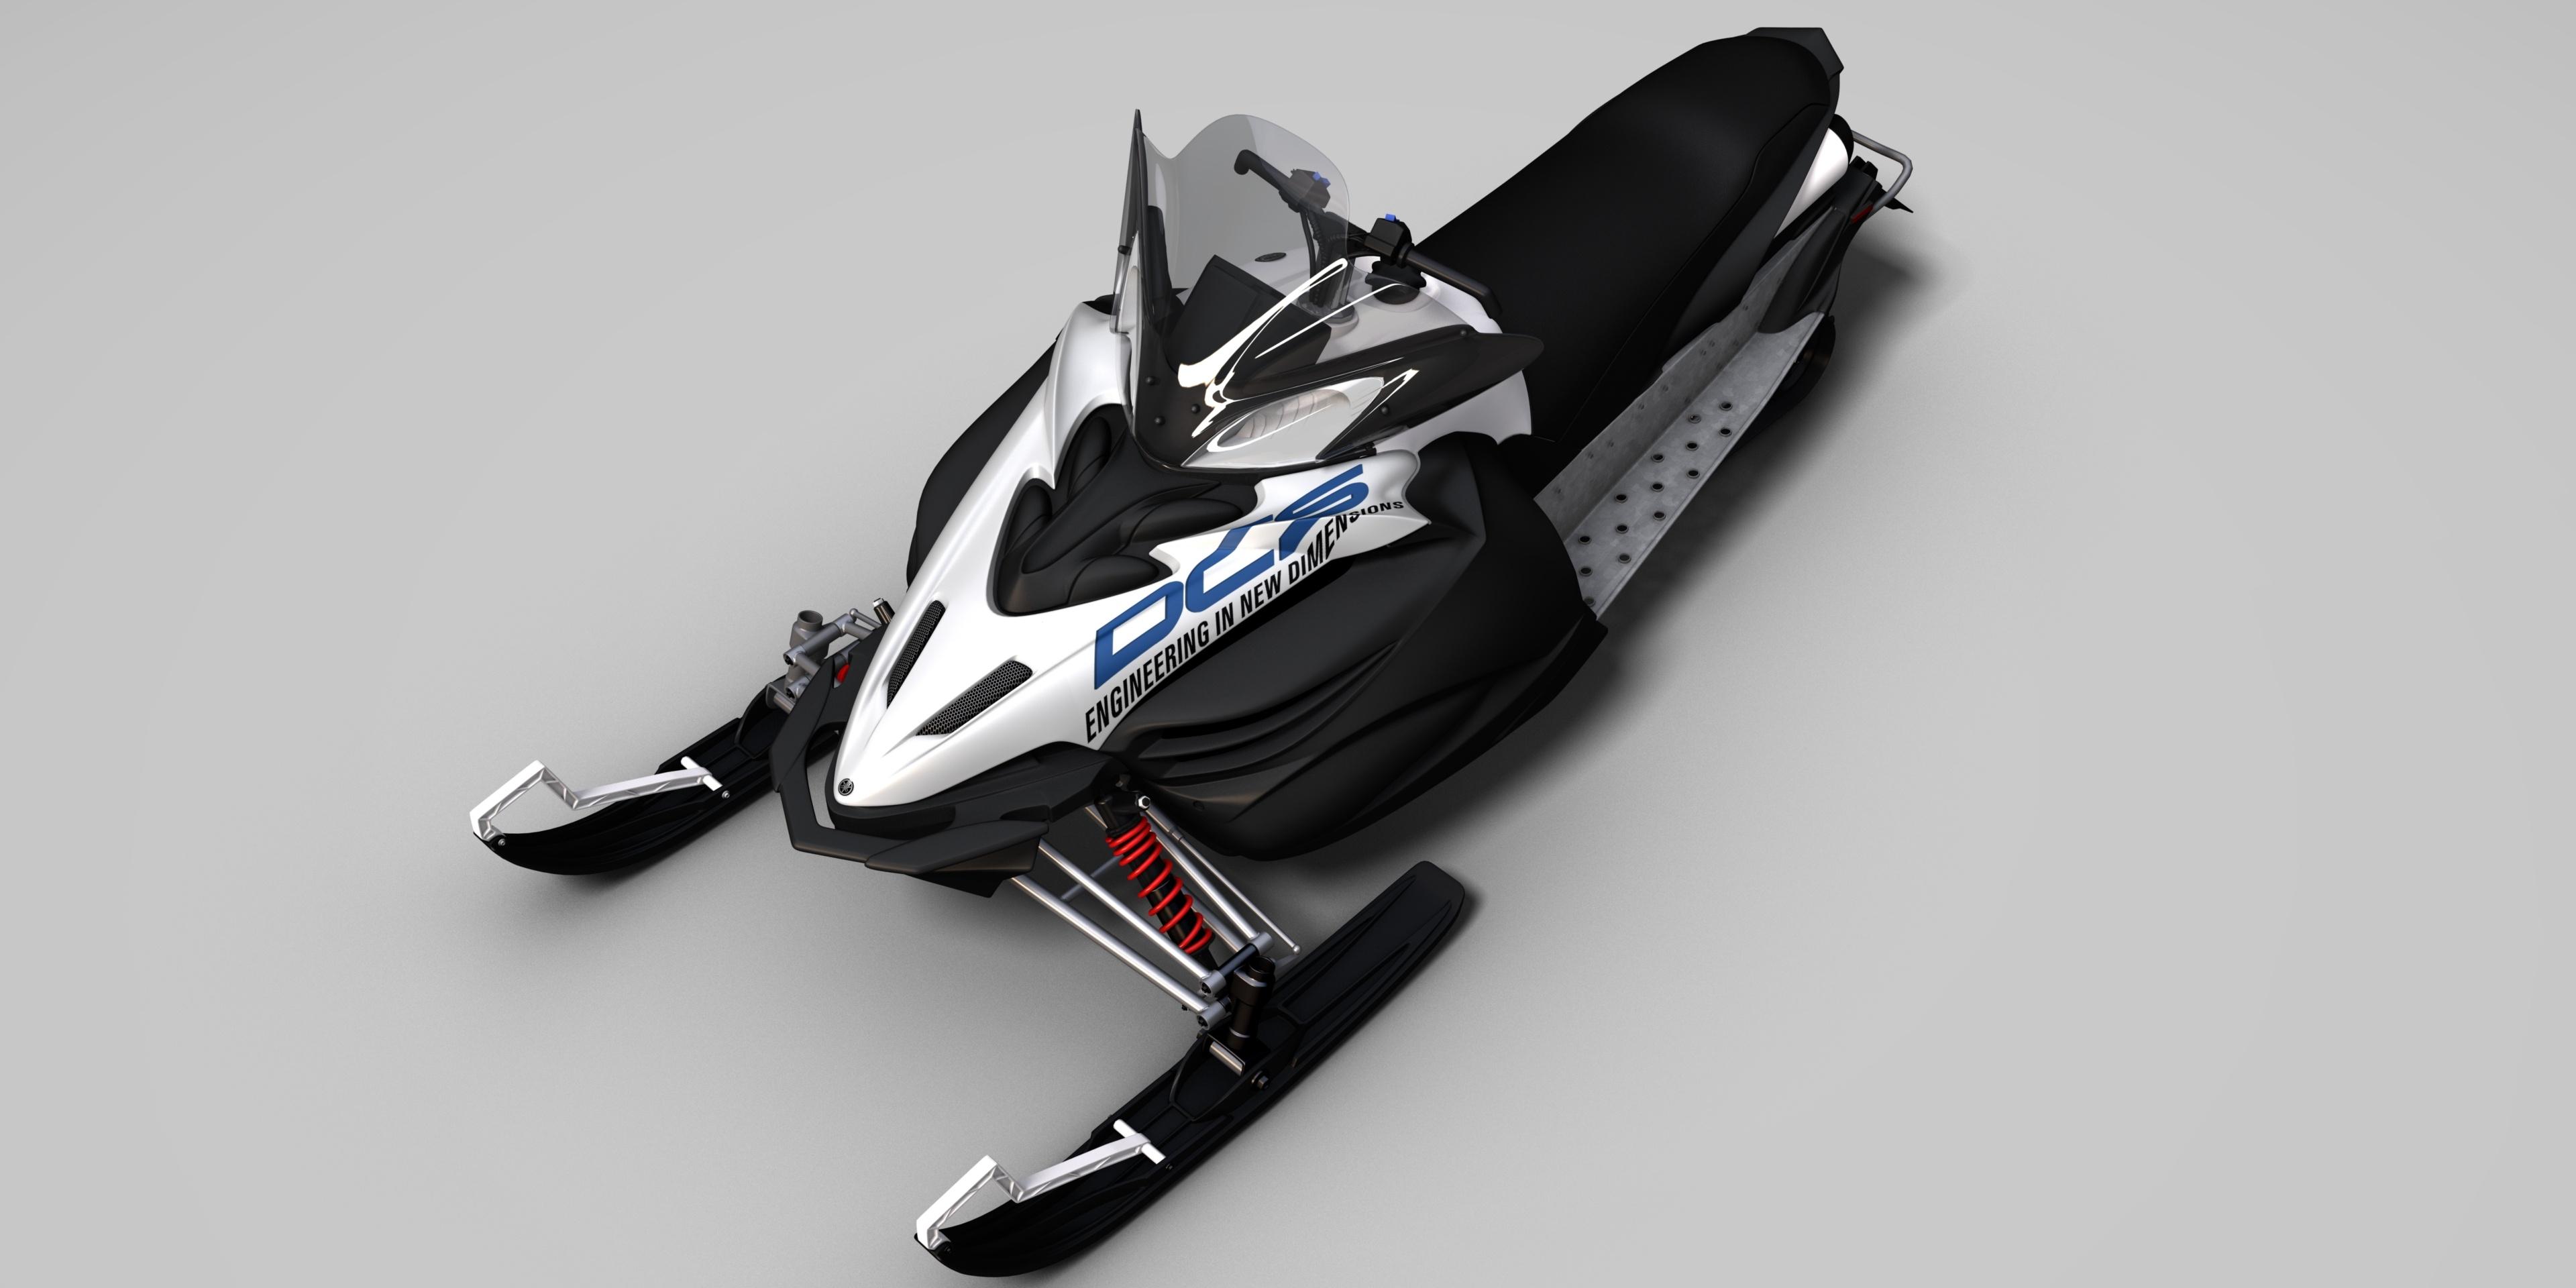 Snowmobile_Perceived Quality 2.jpg